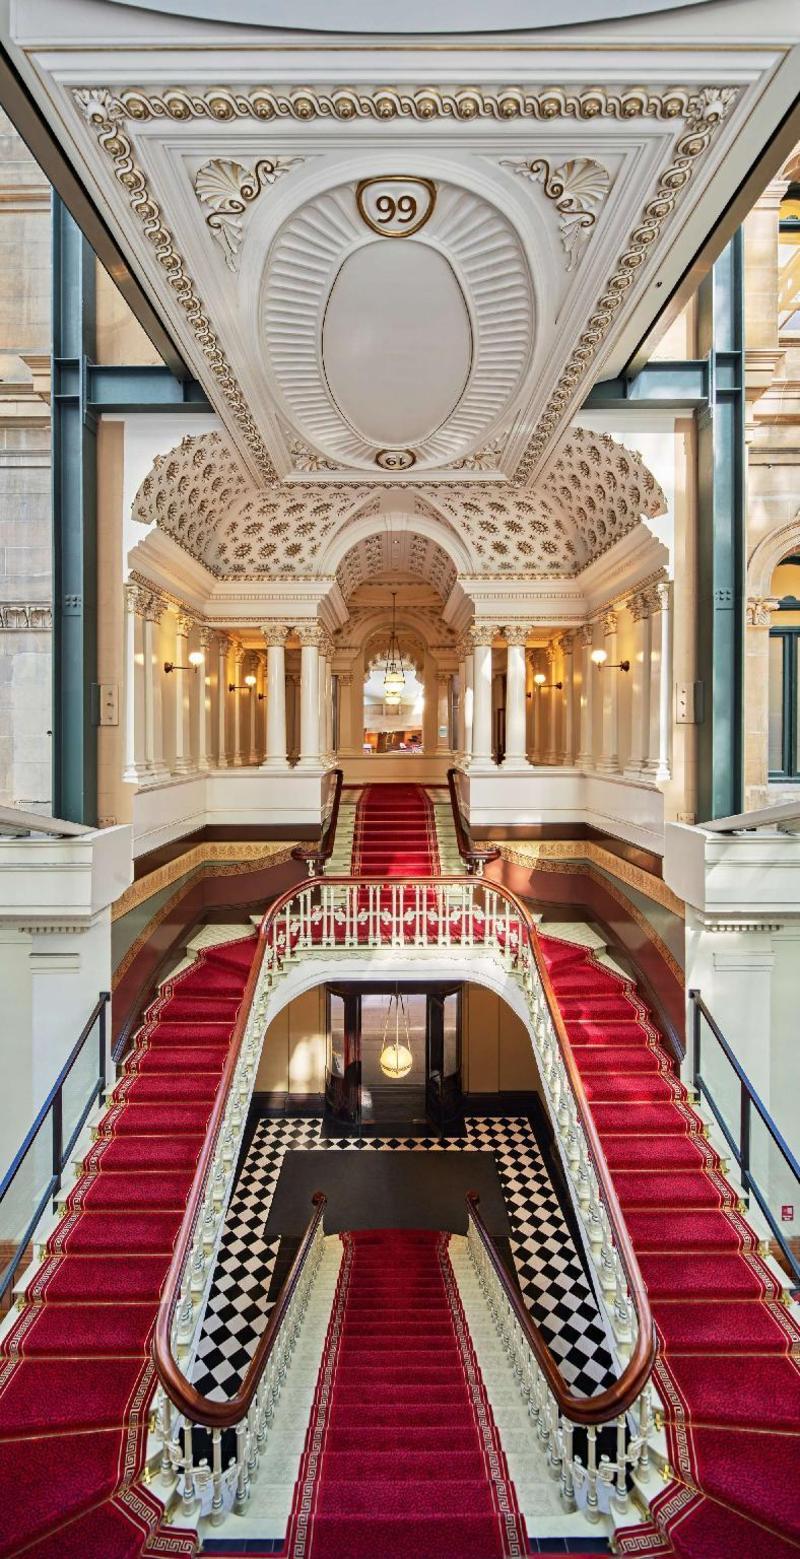 The Fullerton Hotel Sydney - image 3